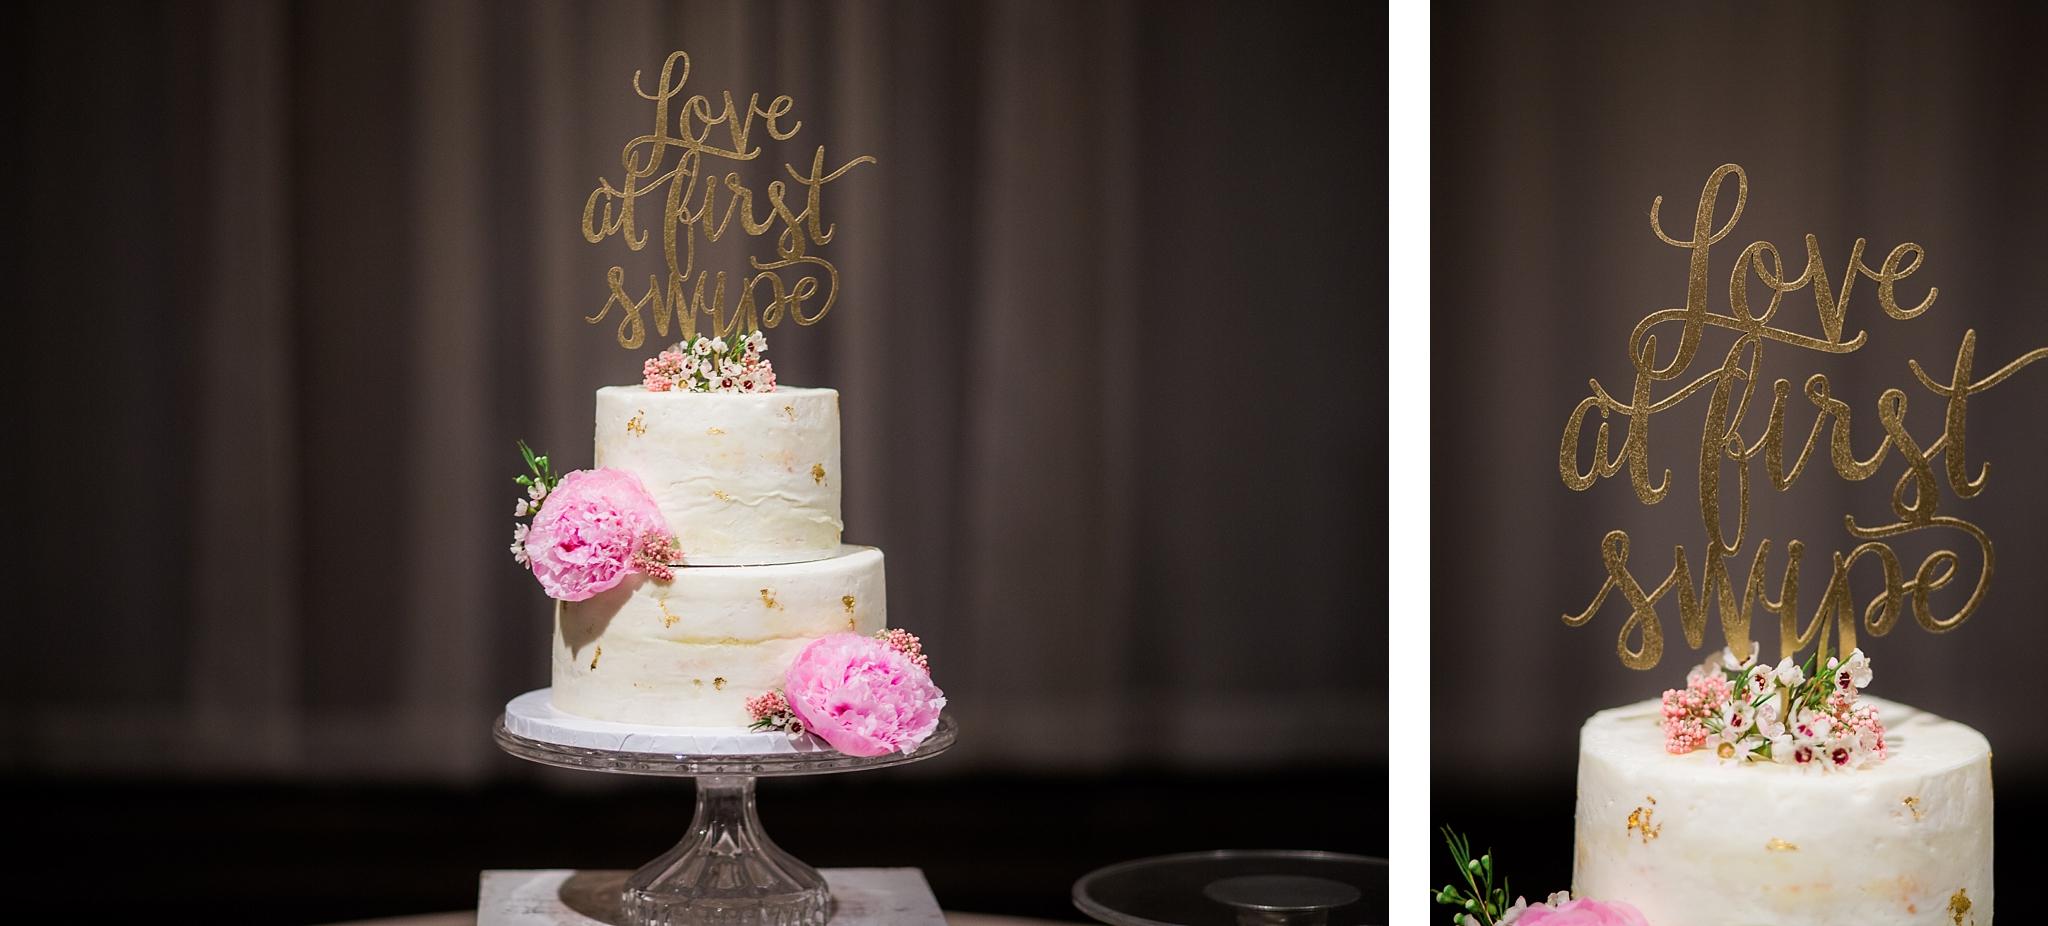 love-at-first-swipe-tinder-wedding.jpg